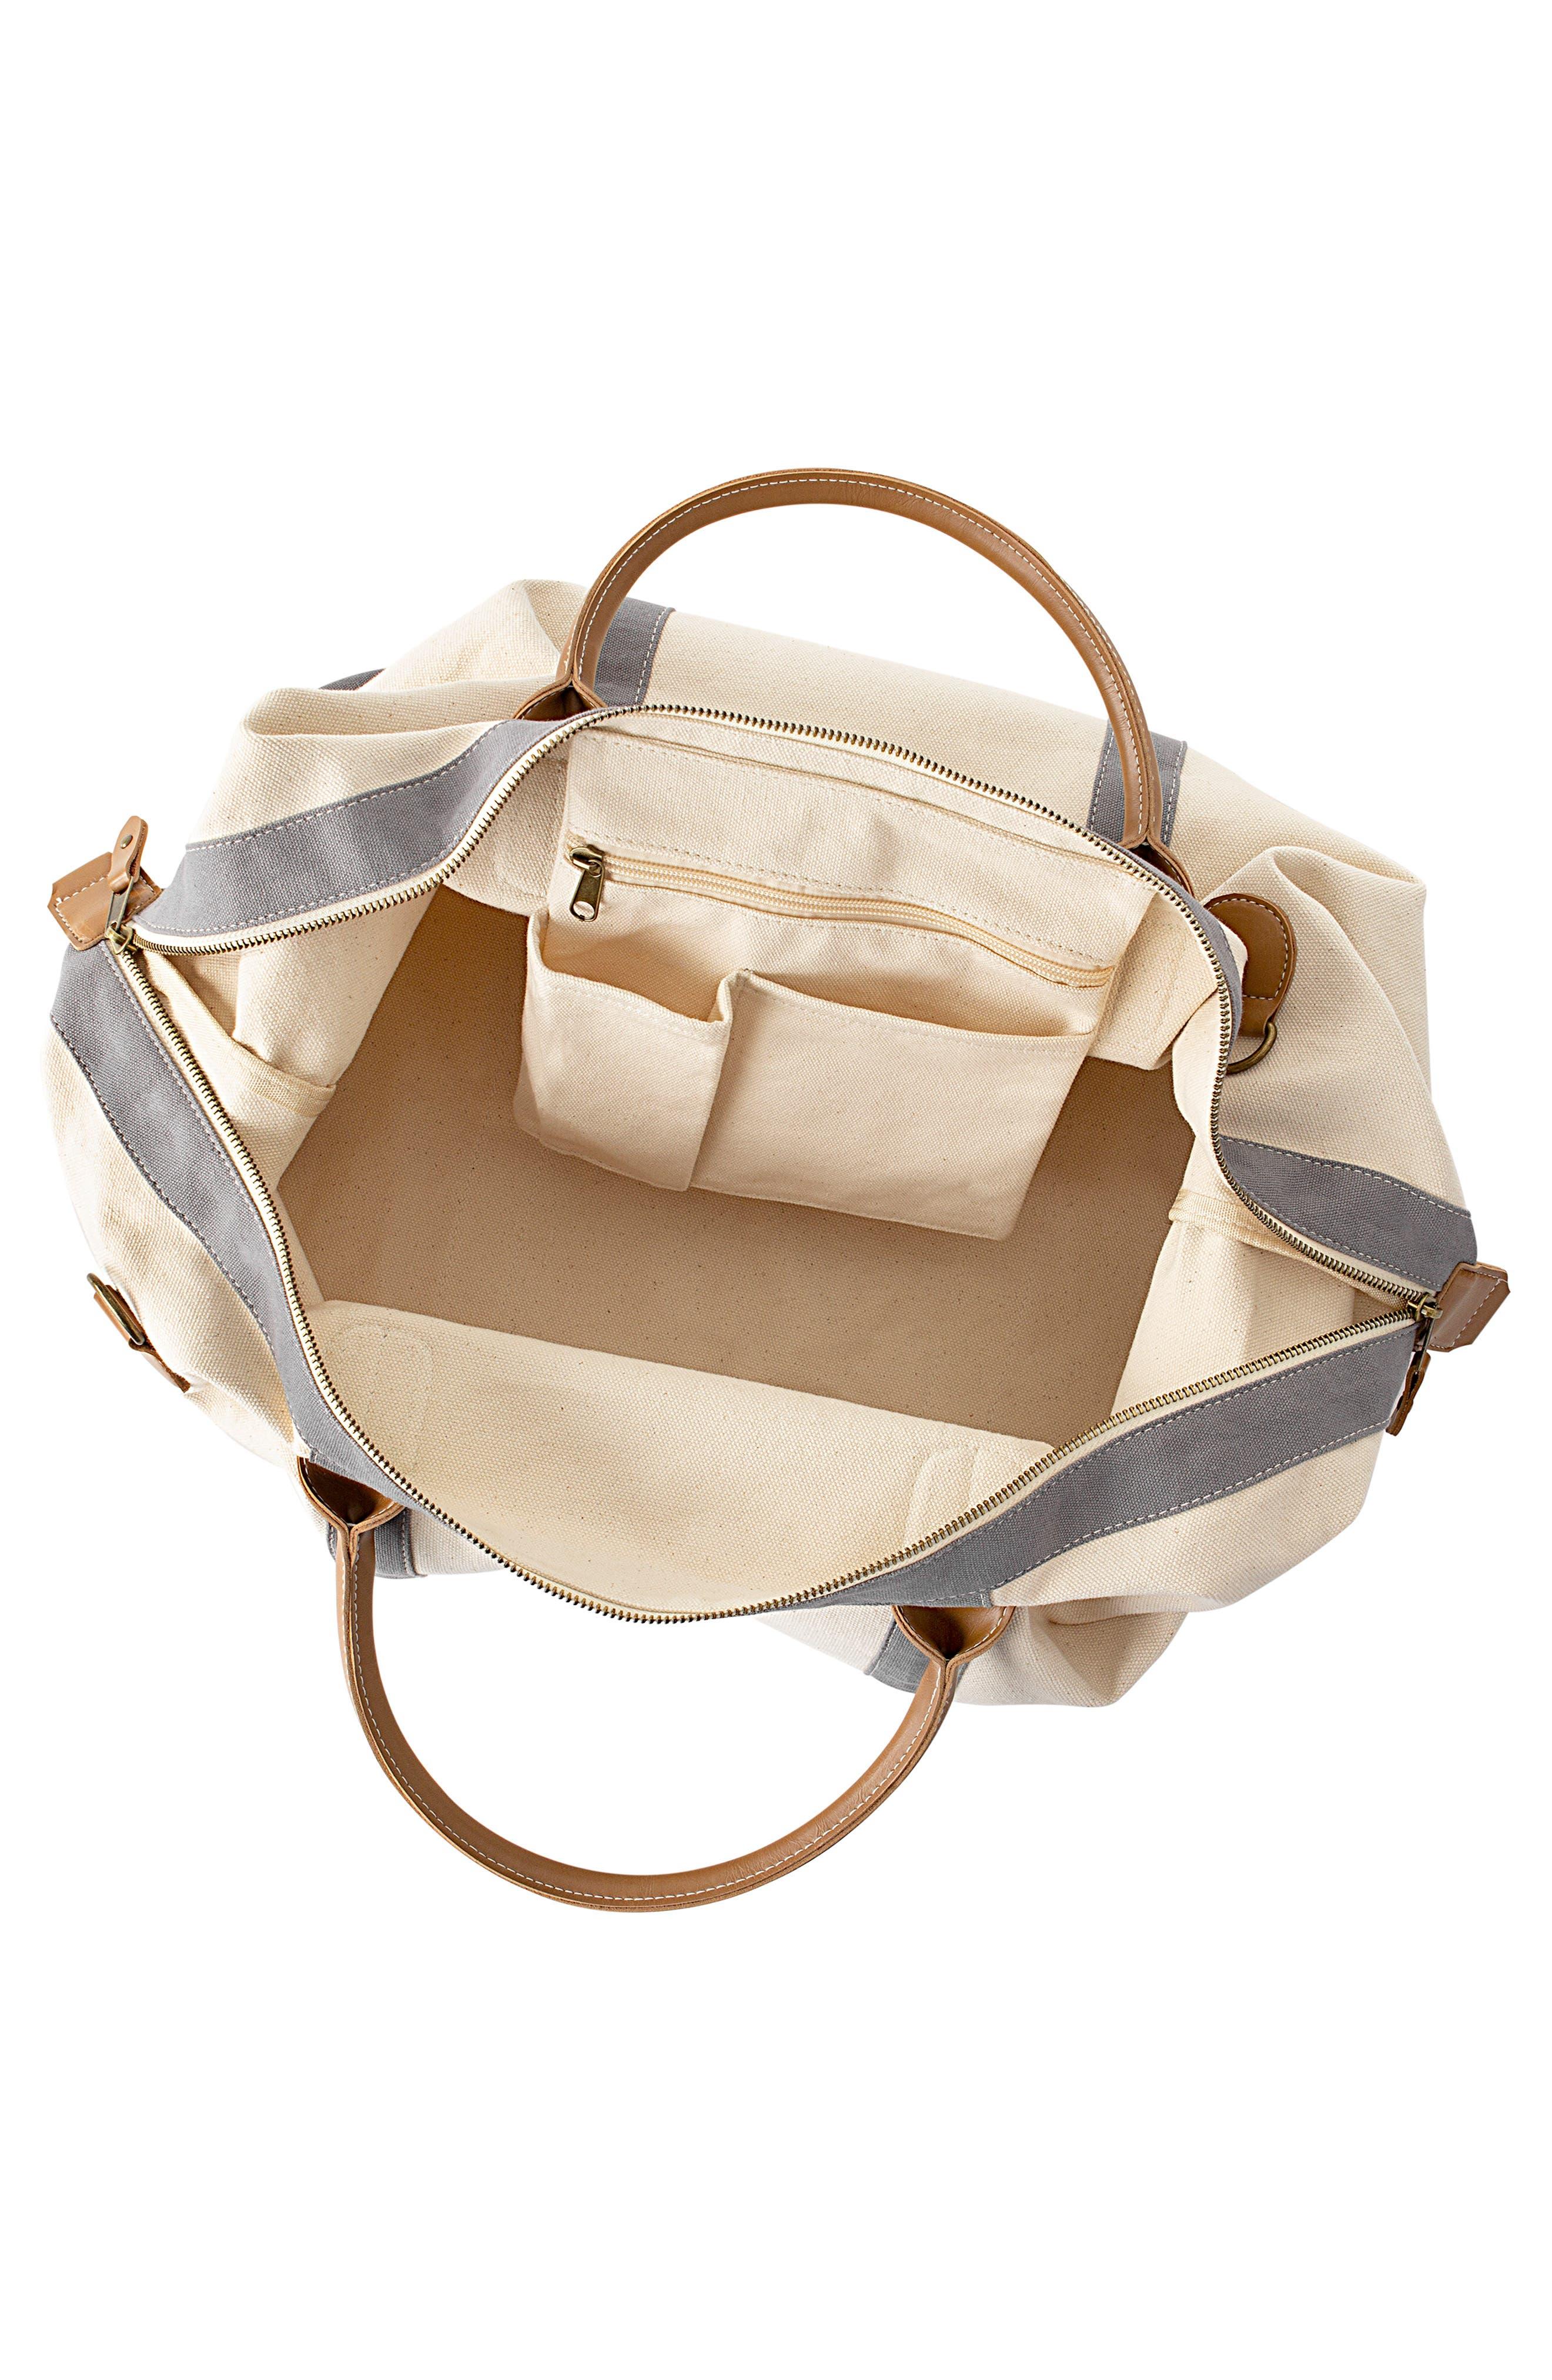 CATHY'S CONCEPTS Cathys Concepts Monogram Canvas Duffle Bag, Main, color, WHITE-J